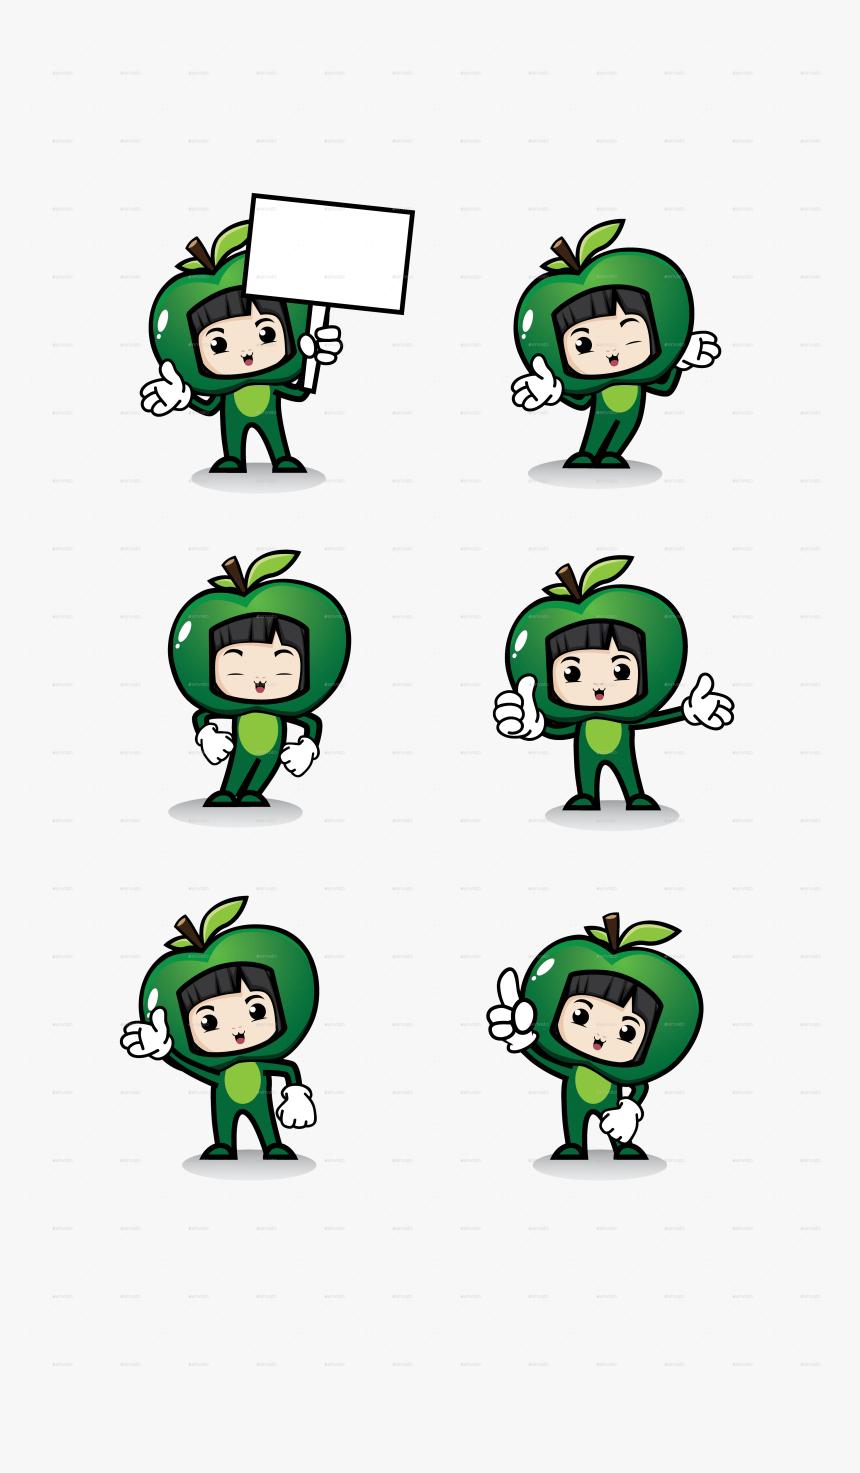 Apple Girl Mascot Apple Girl Mascot - Cartoon, HD Png Download, Free Download